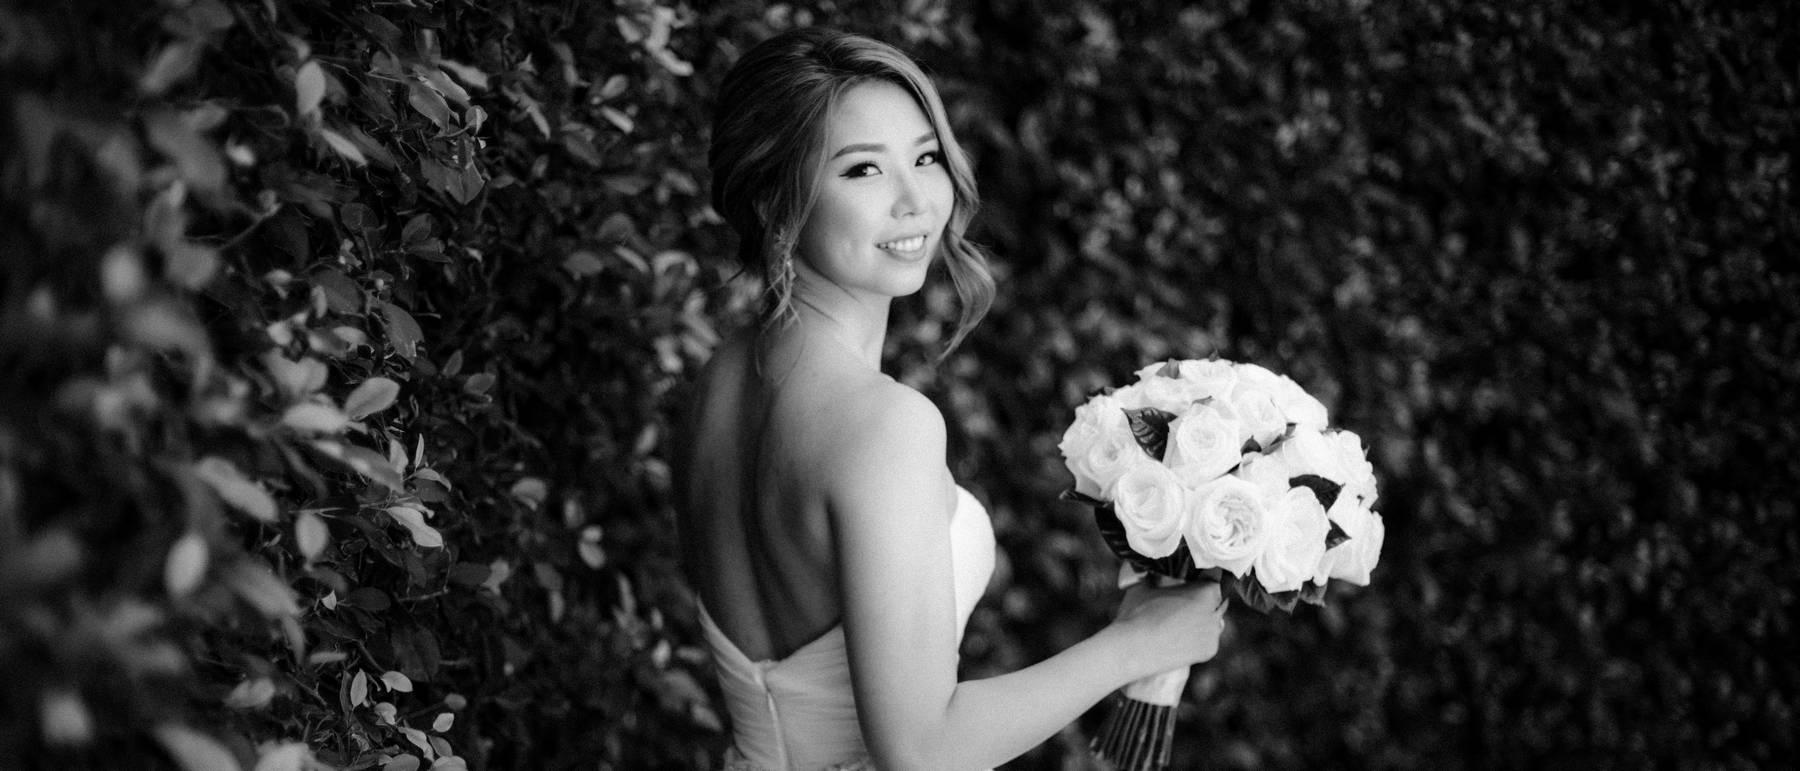 johnandjoseph-wedding-photographer-hz-slider-207